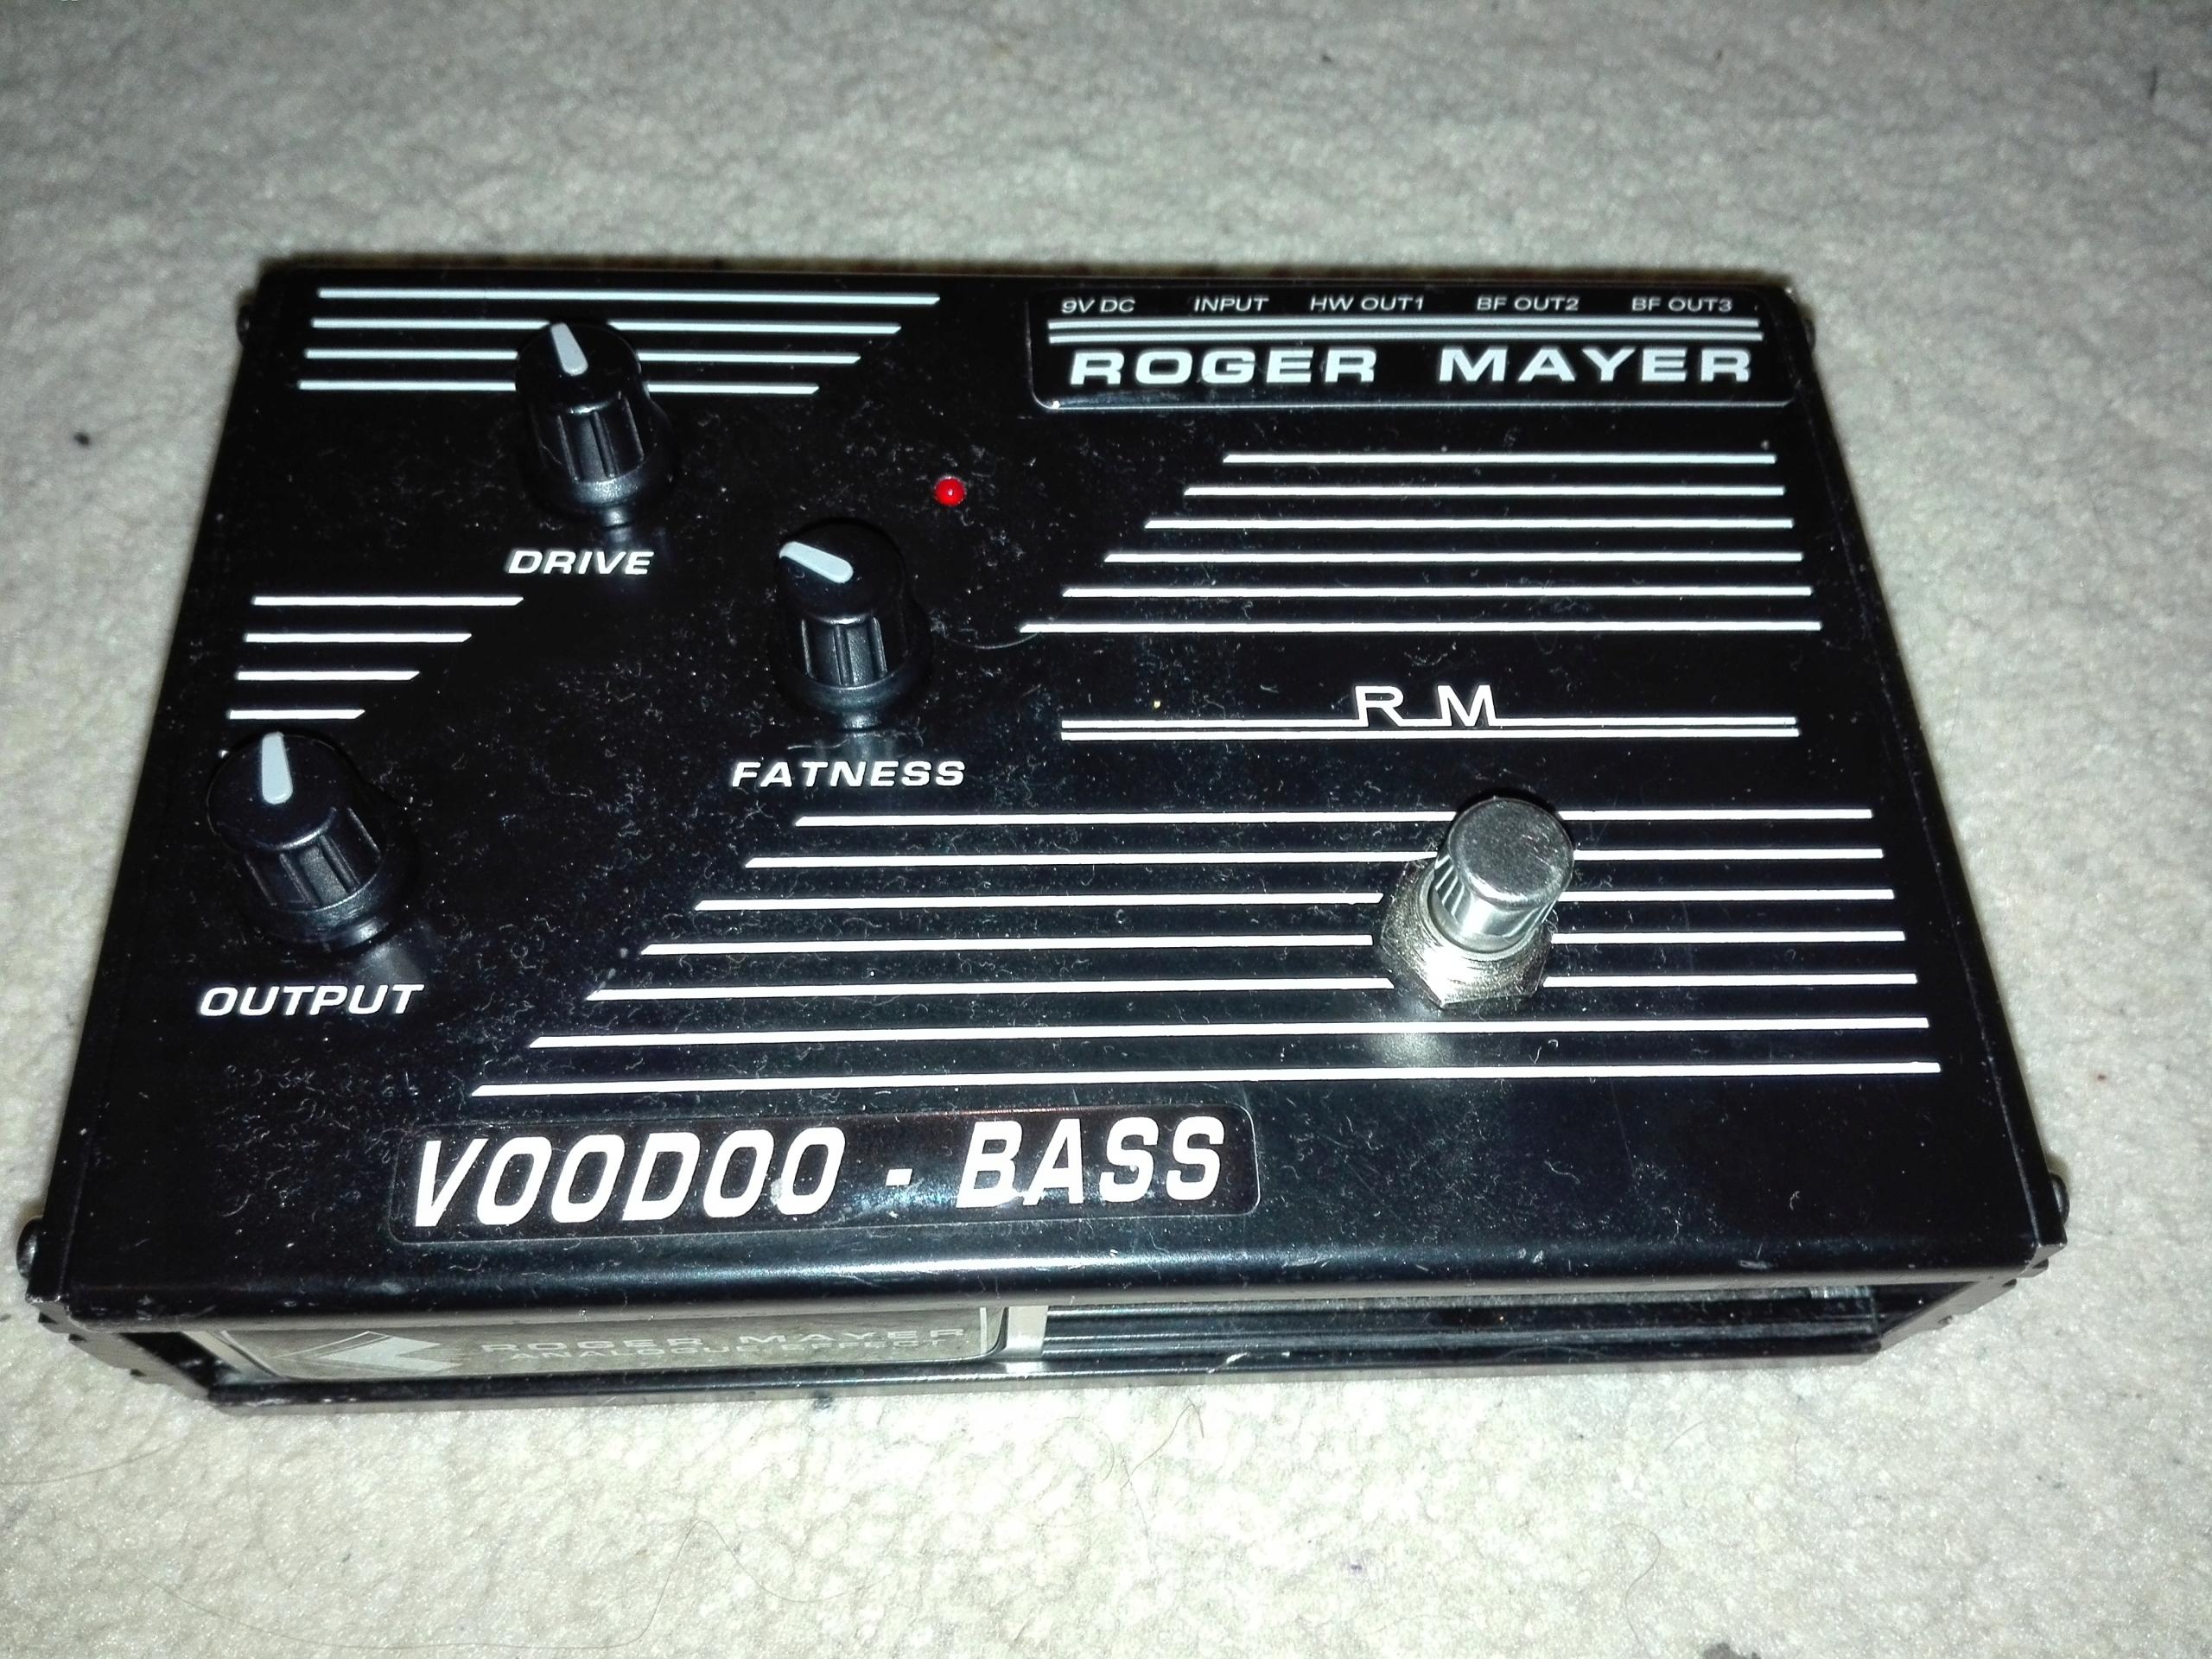 Roger Mayer VooDoo Bass overdrive distortion